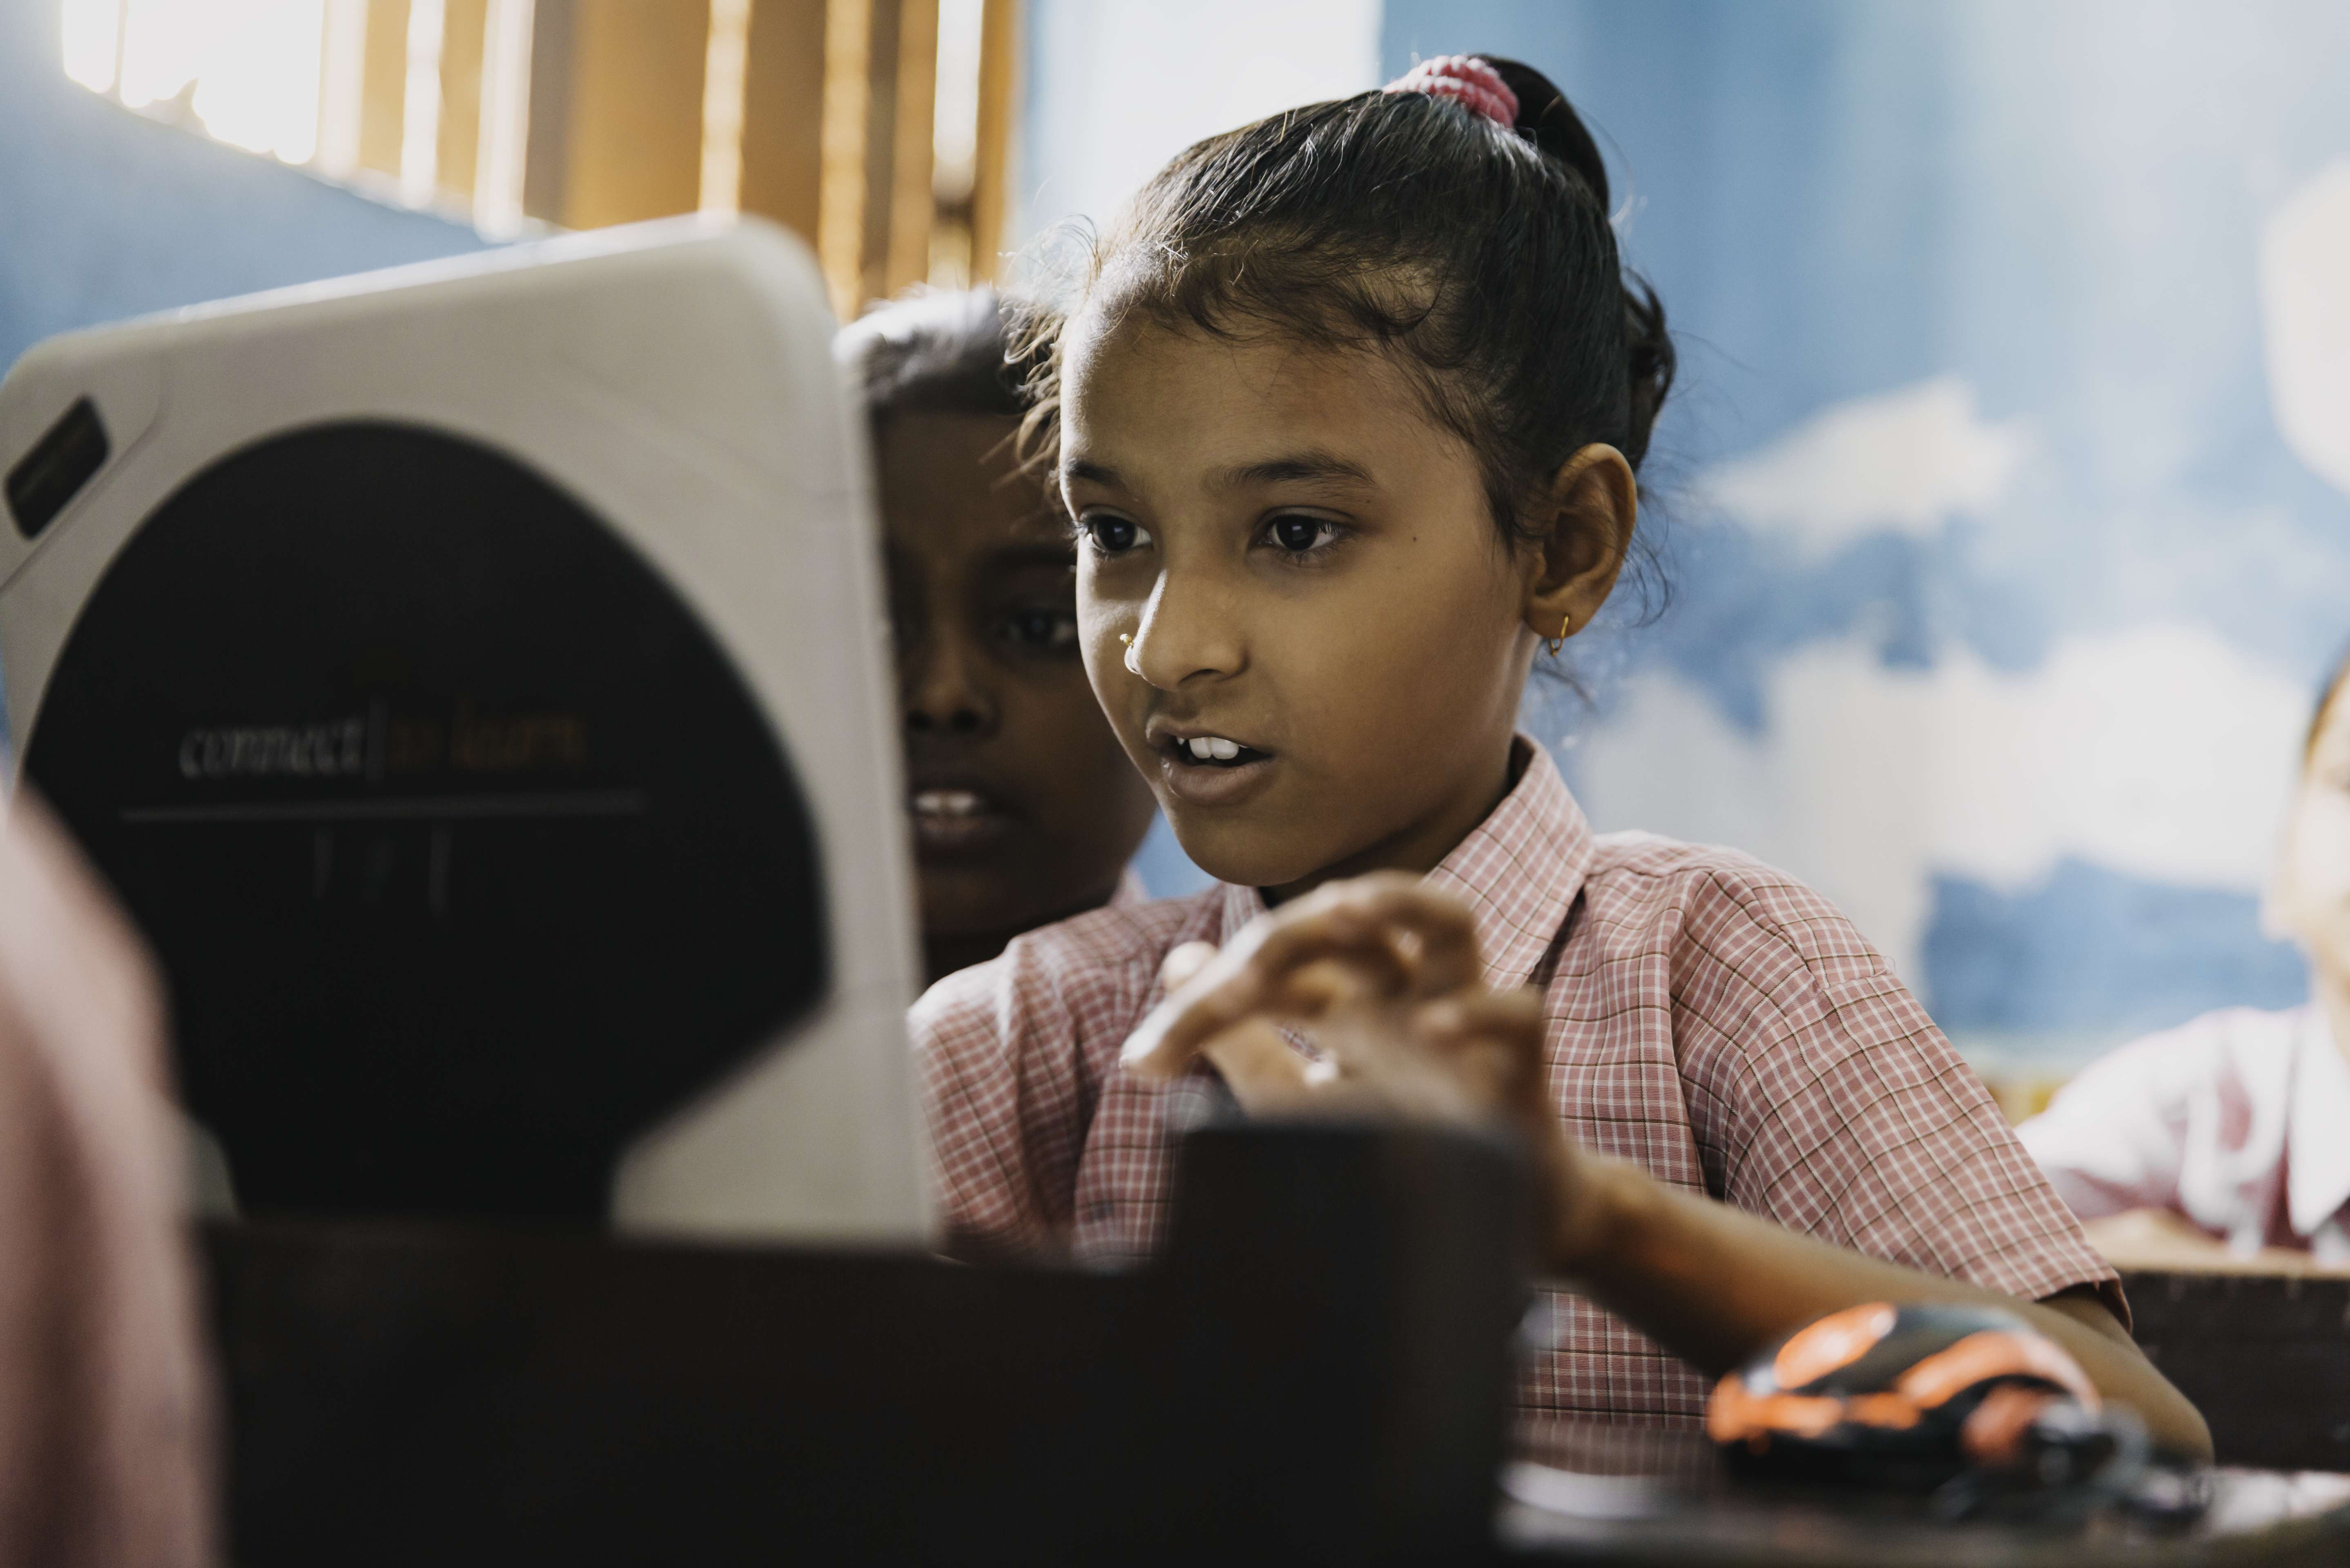 sdg-4-quality-education